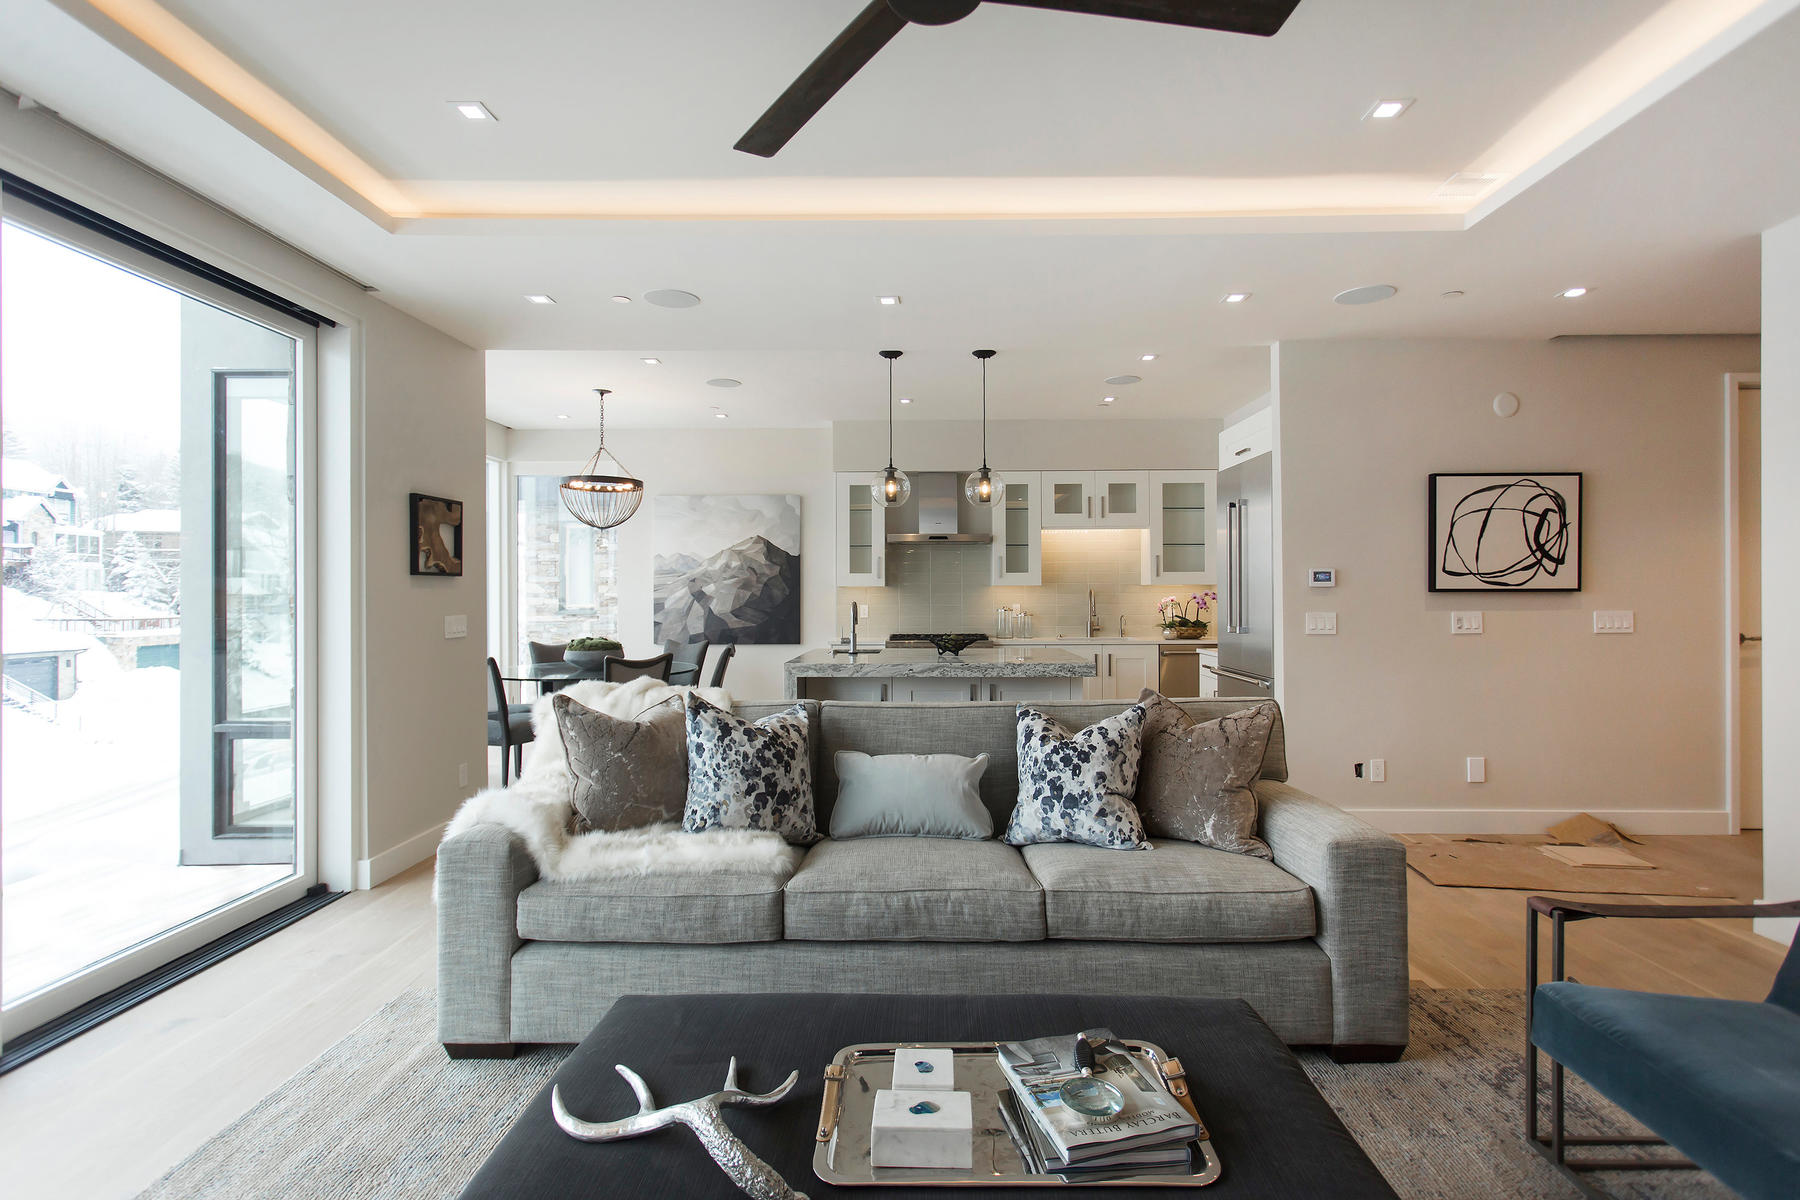 共管式独立产权公寓 为 销售 在 New Contemporary Construction in Old Town 300 Deer Valley Lp #C 帕克城, 犹他州, 84060 美国